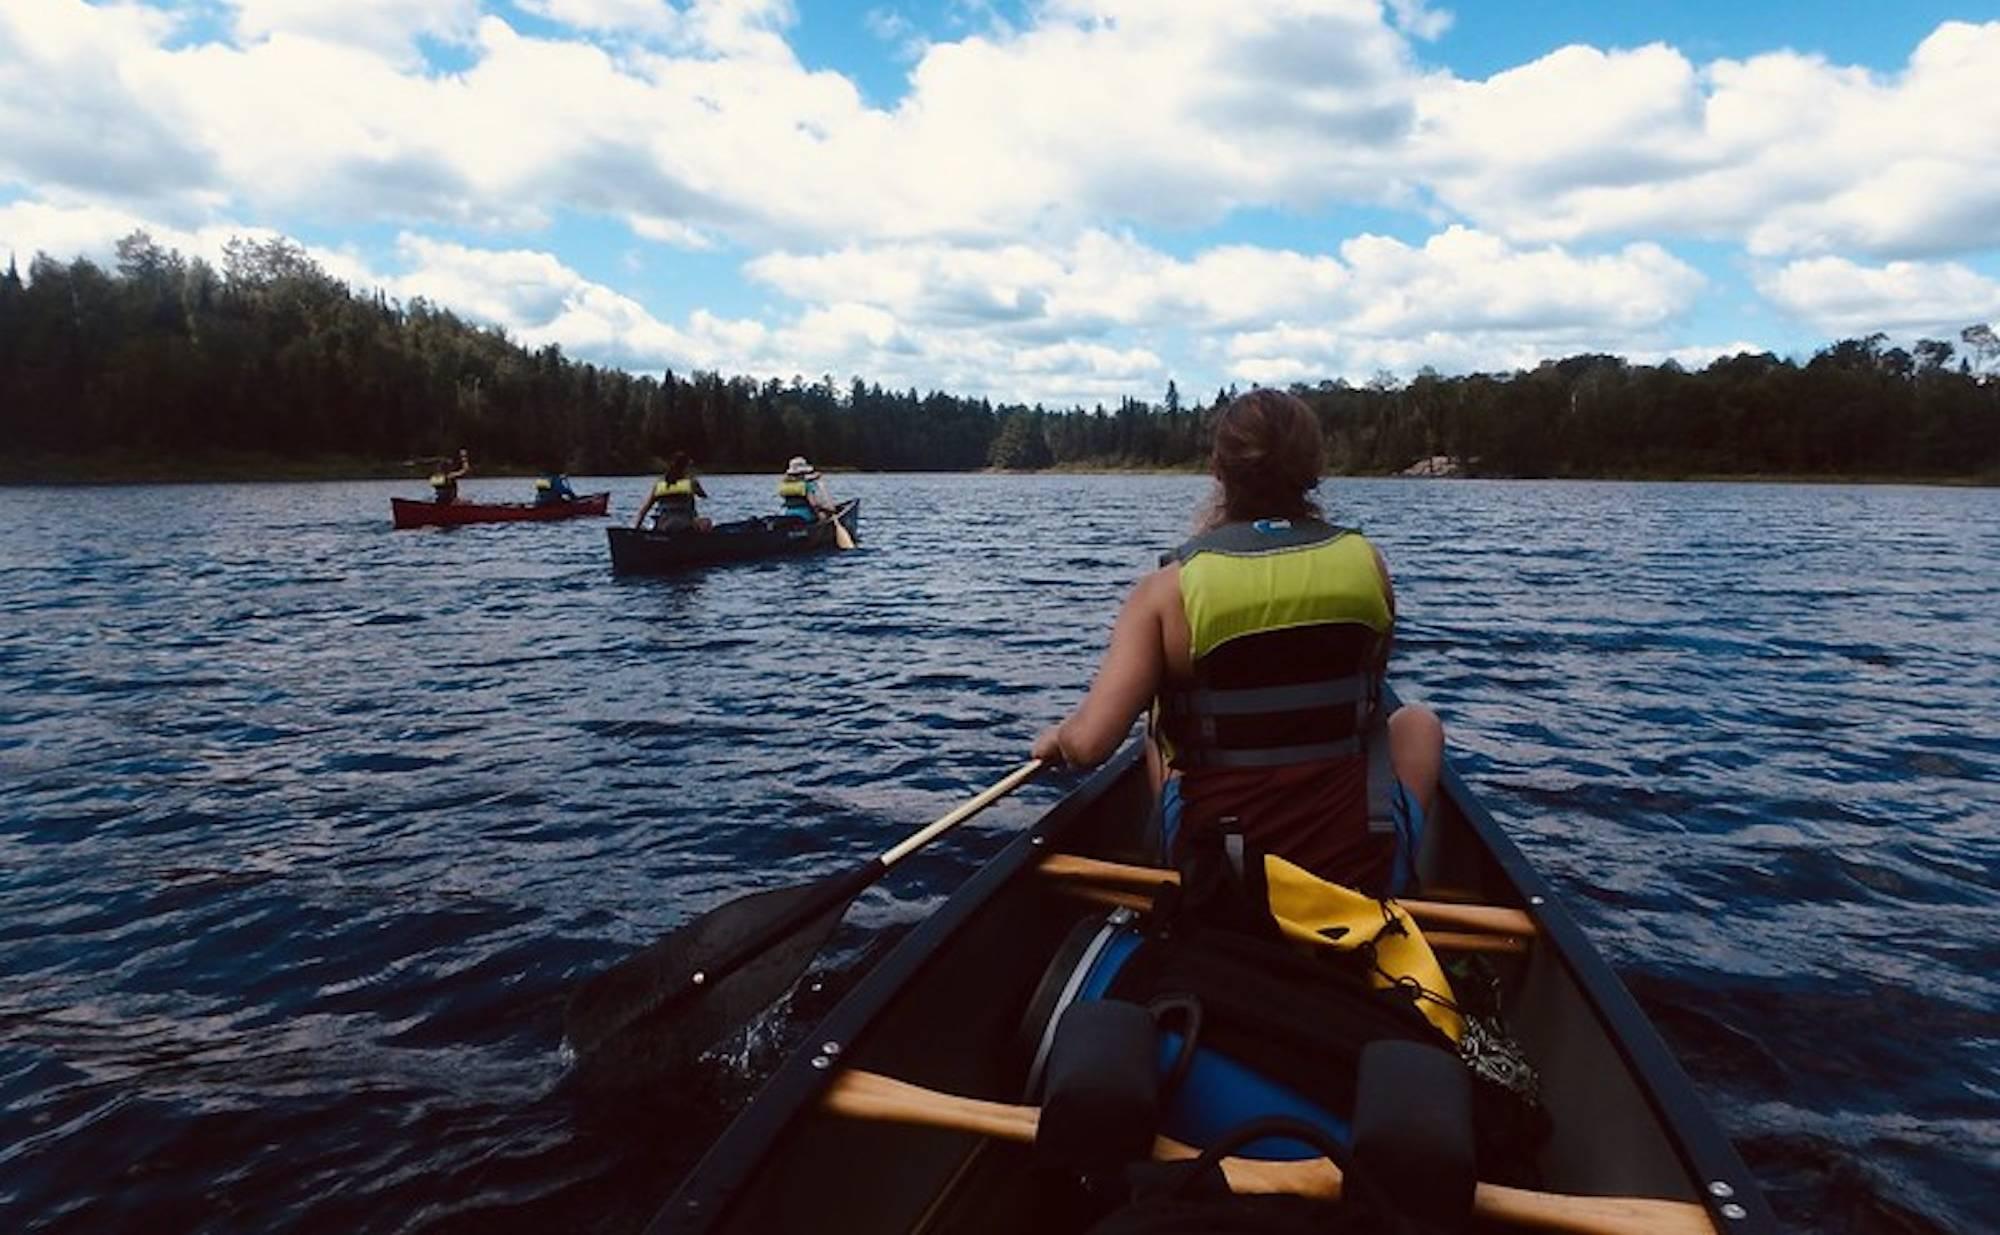 Big City Mountaineers programming kayaking